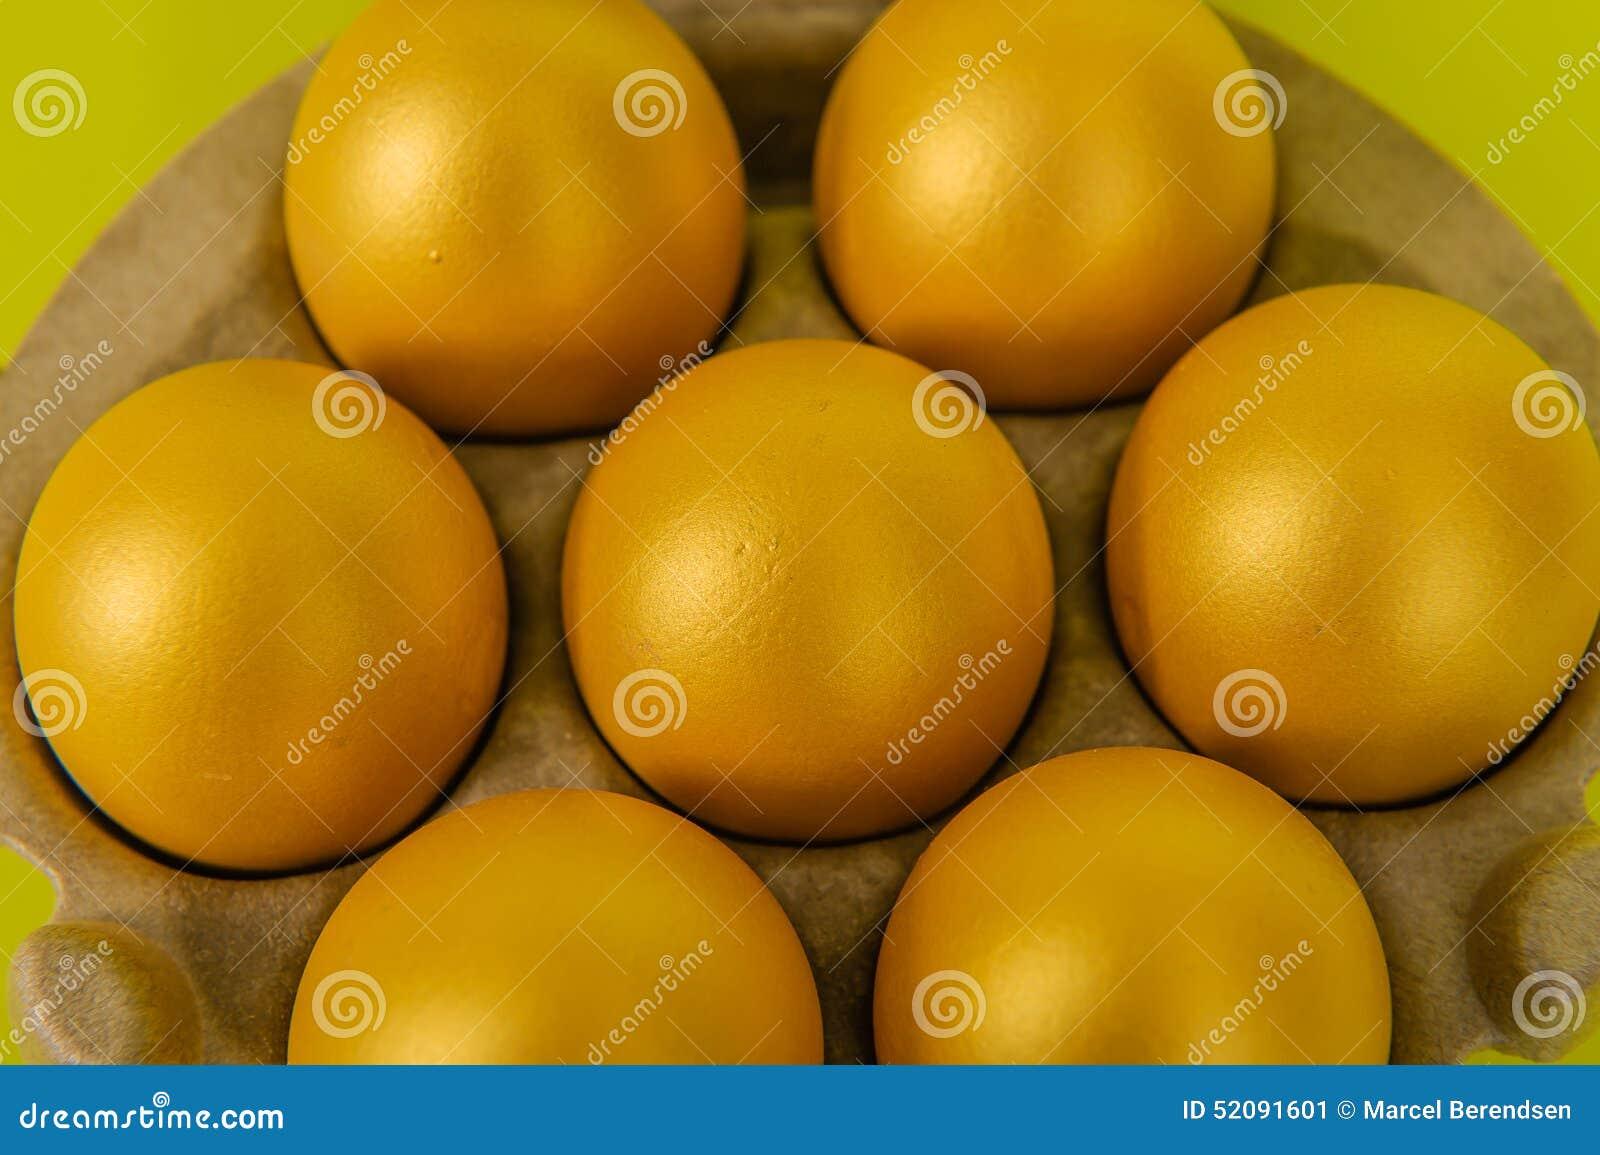 Poultry - Golden Eggs